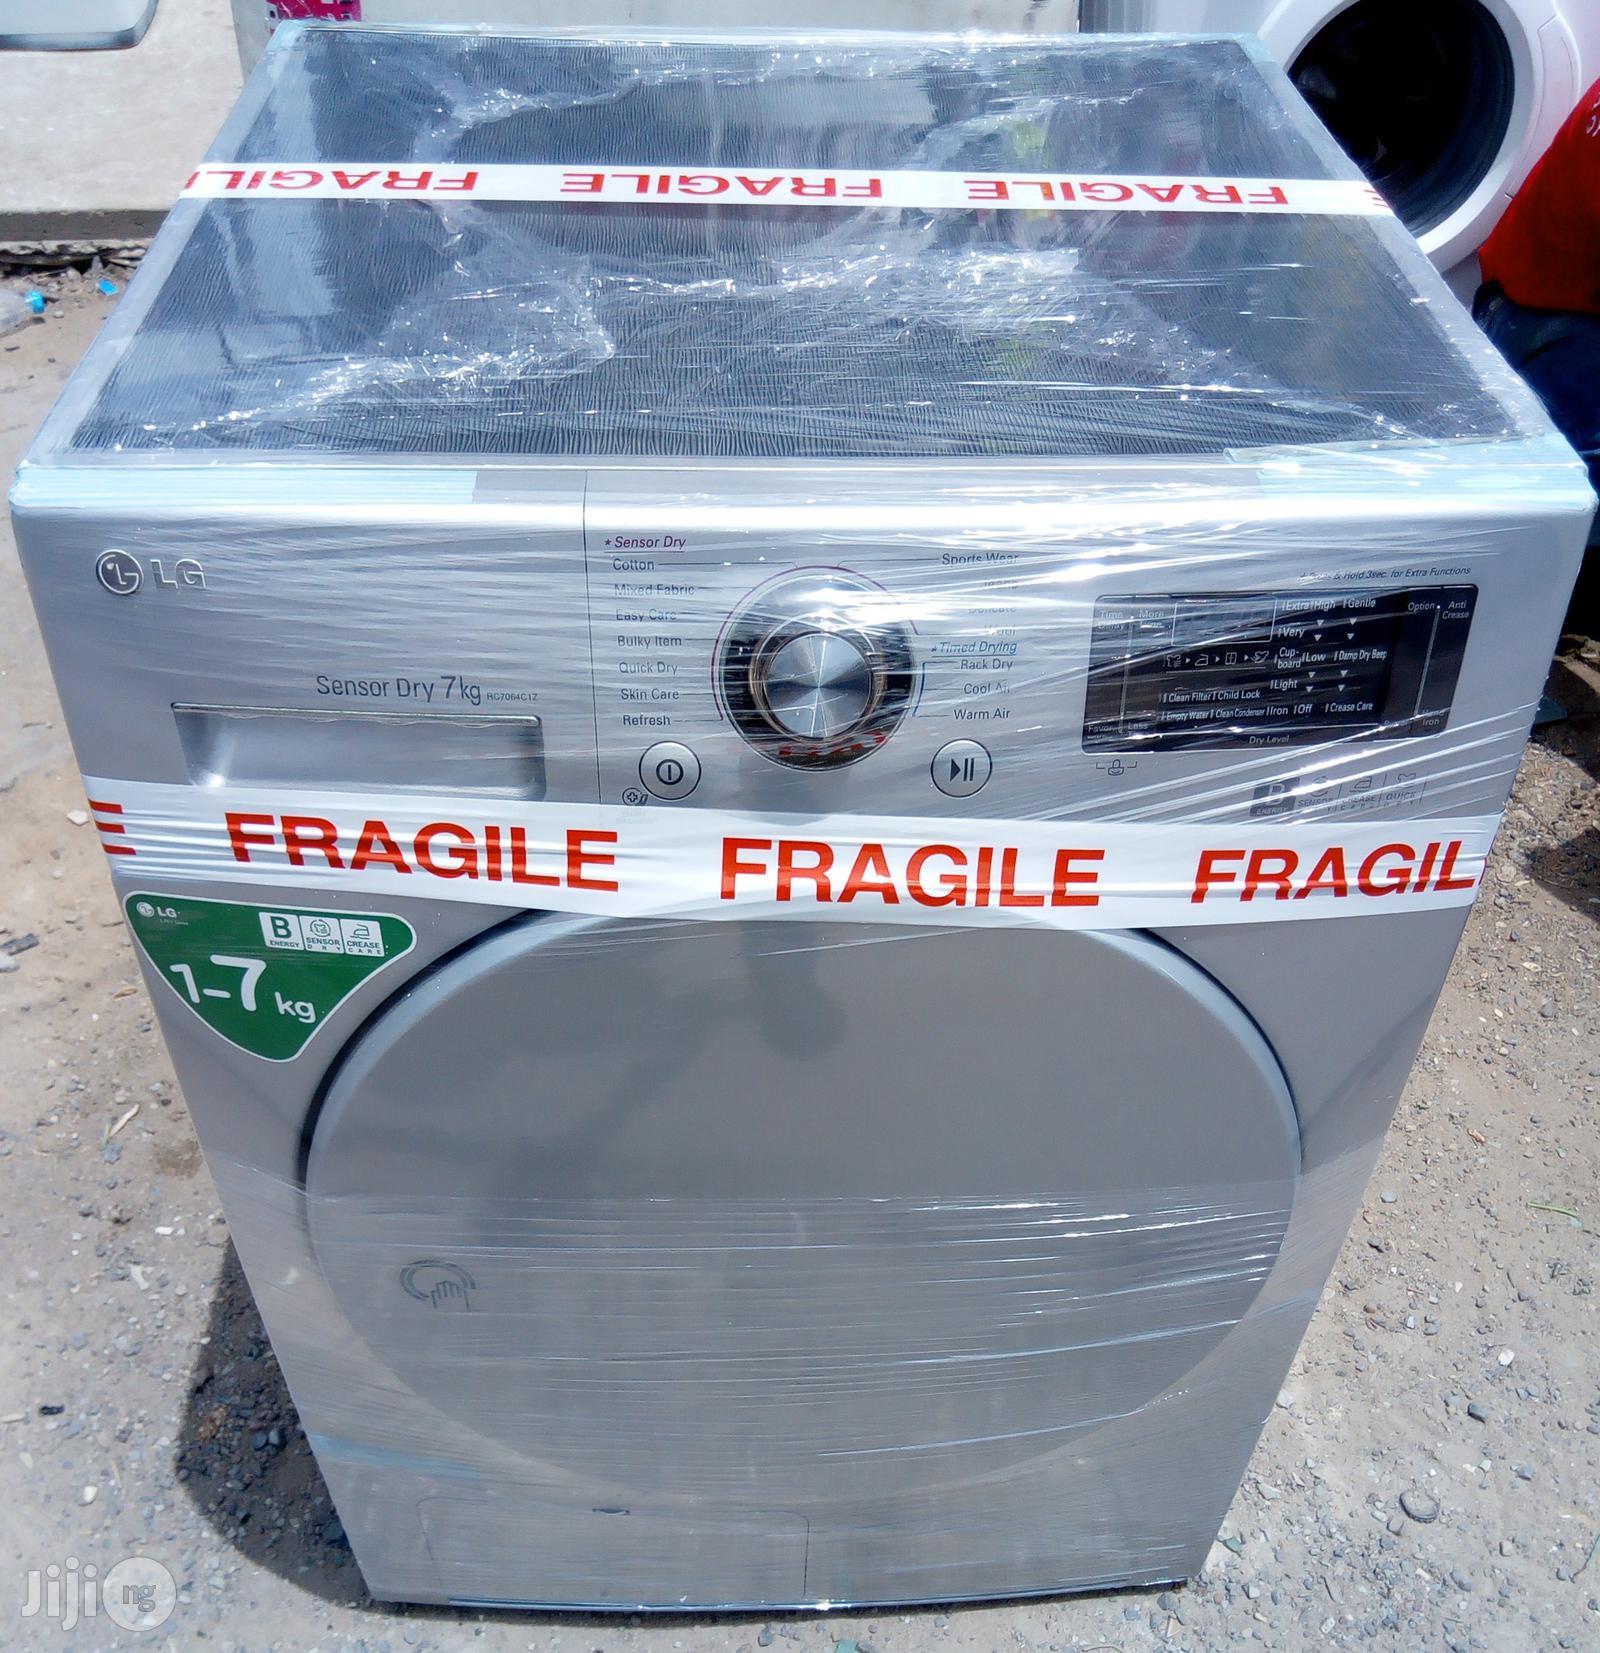 LG 7kg Sensor Dryer   Home Appliances for sale in Lagos State, Nigeria